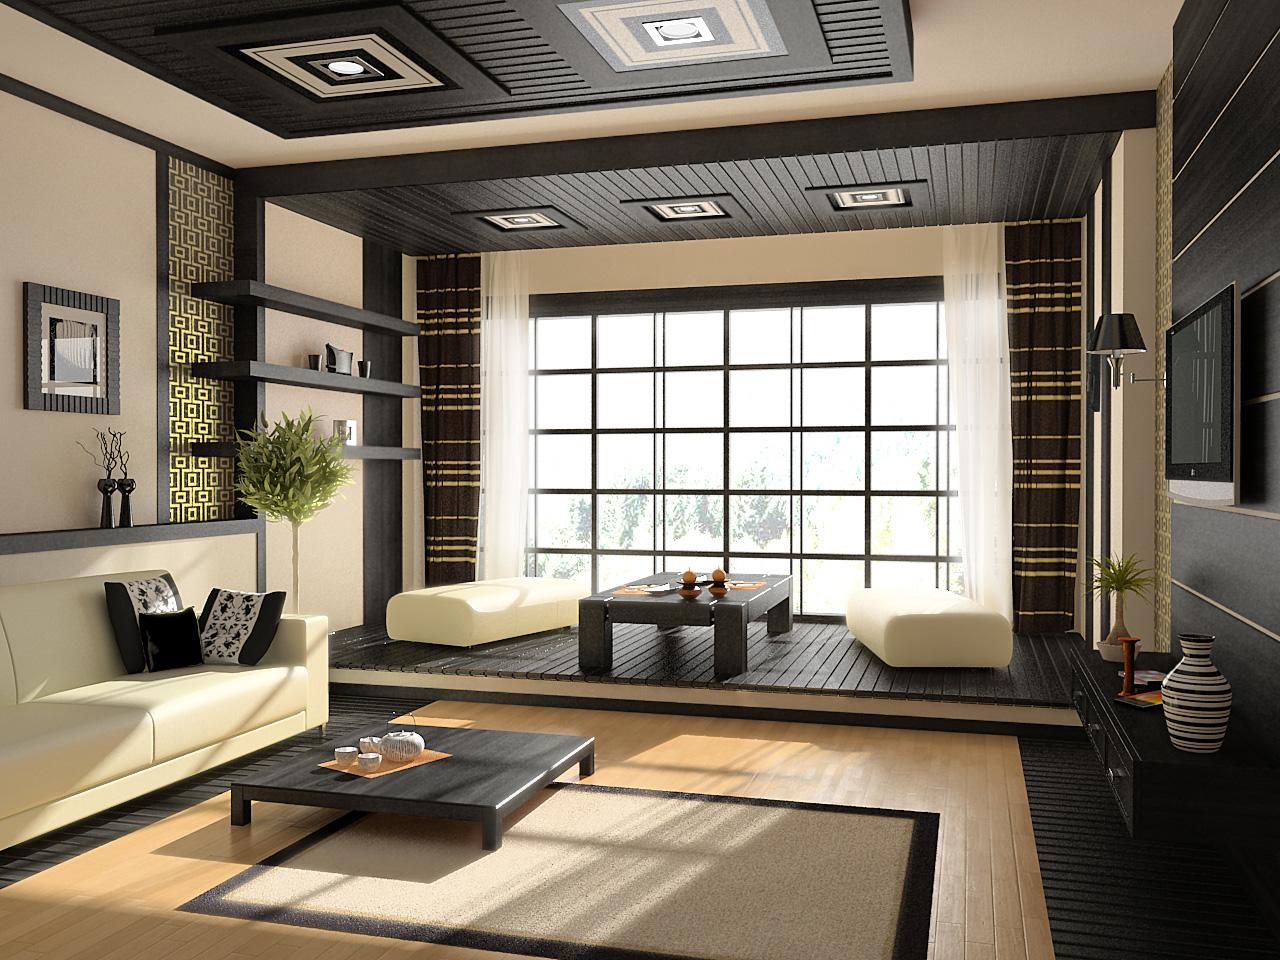 Гостиная в стиле японского минимализма